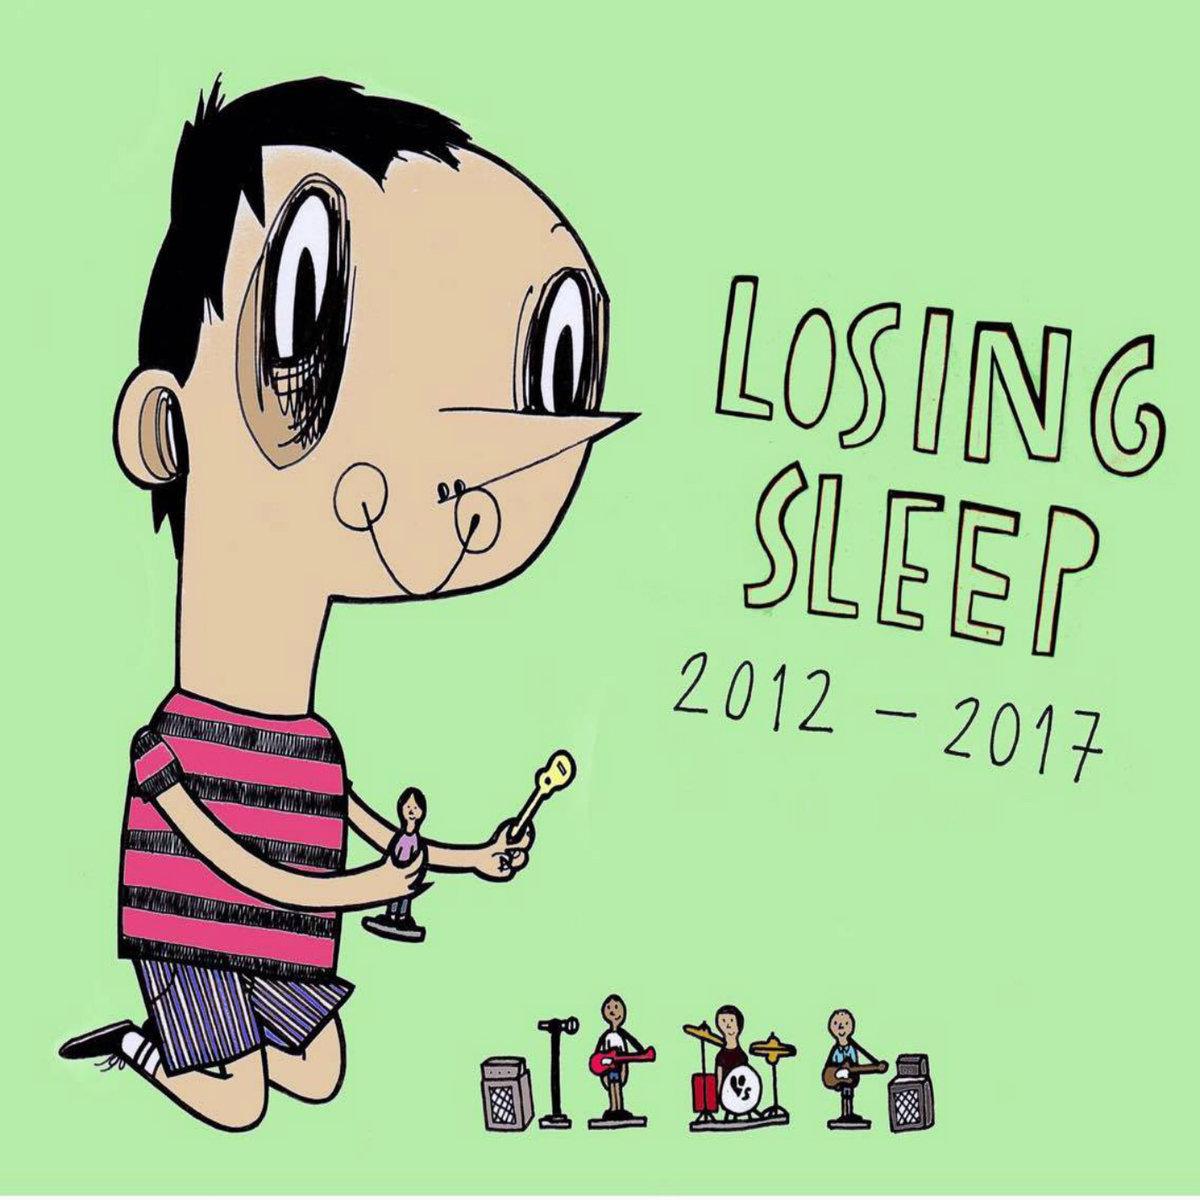 Losing Sleep - 2012-2017